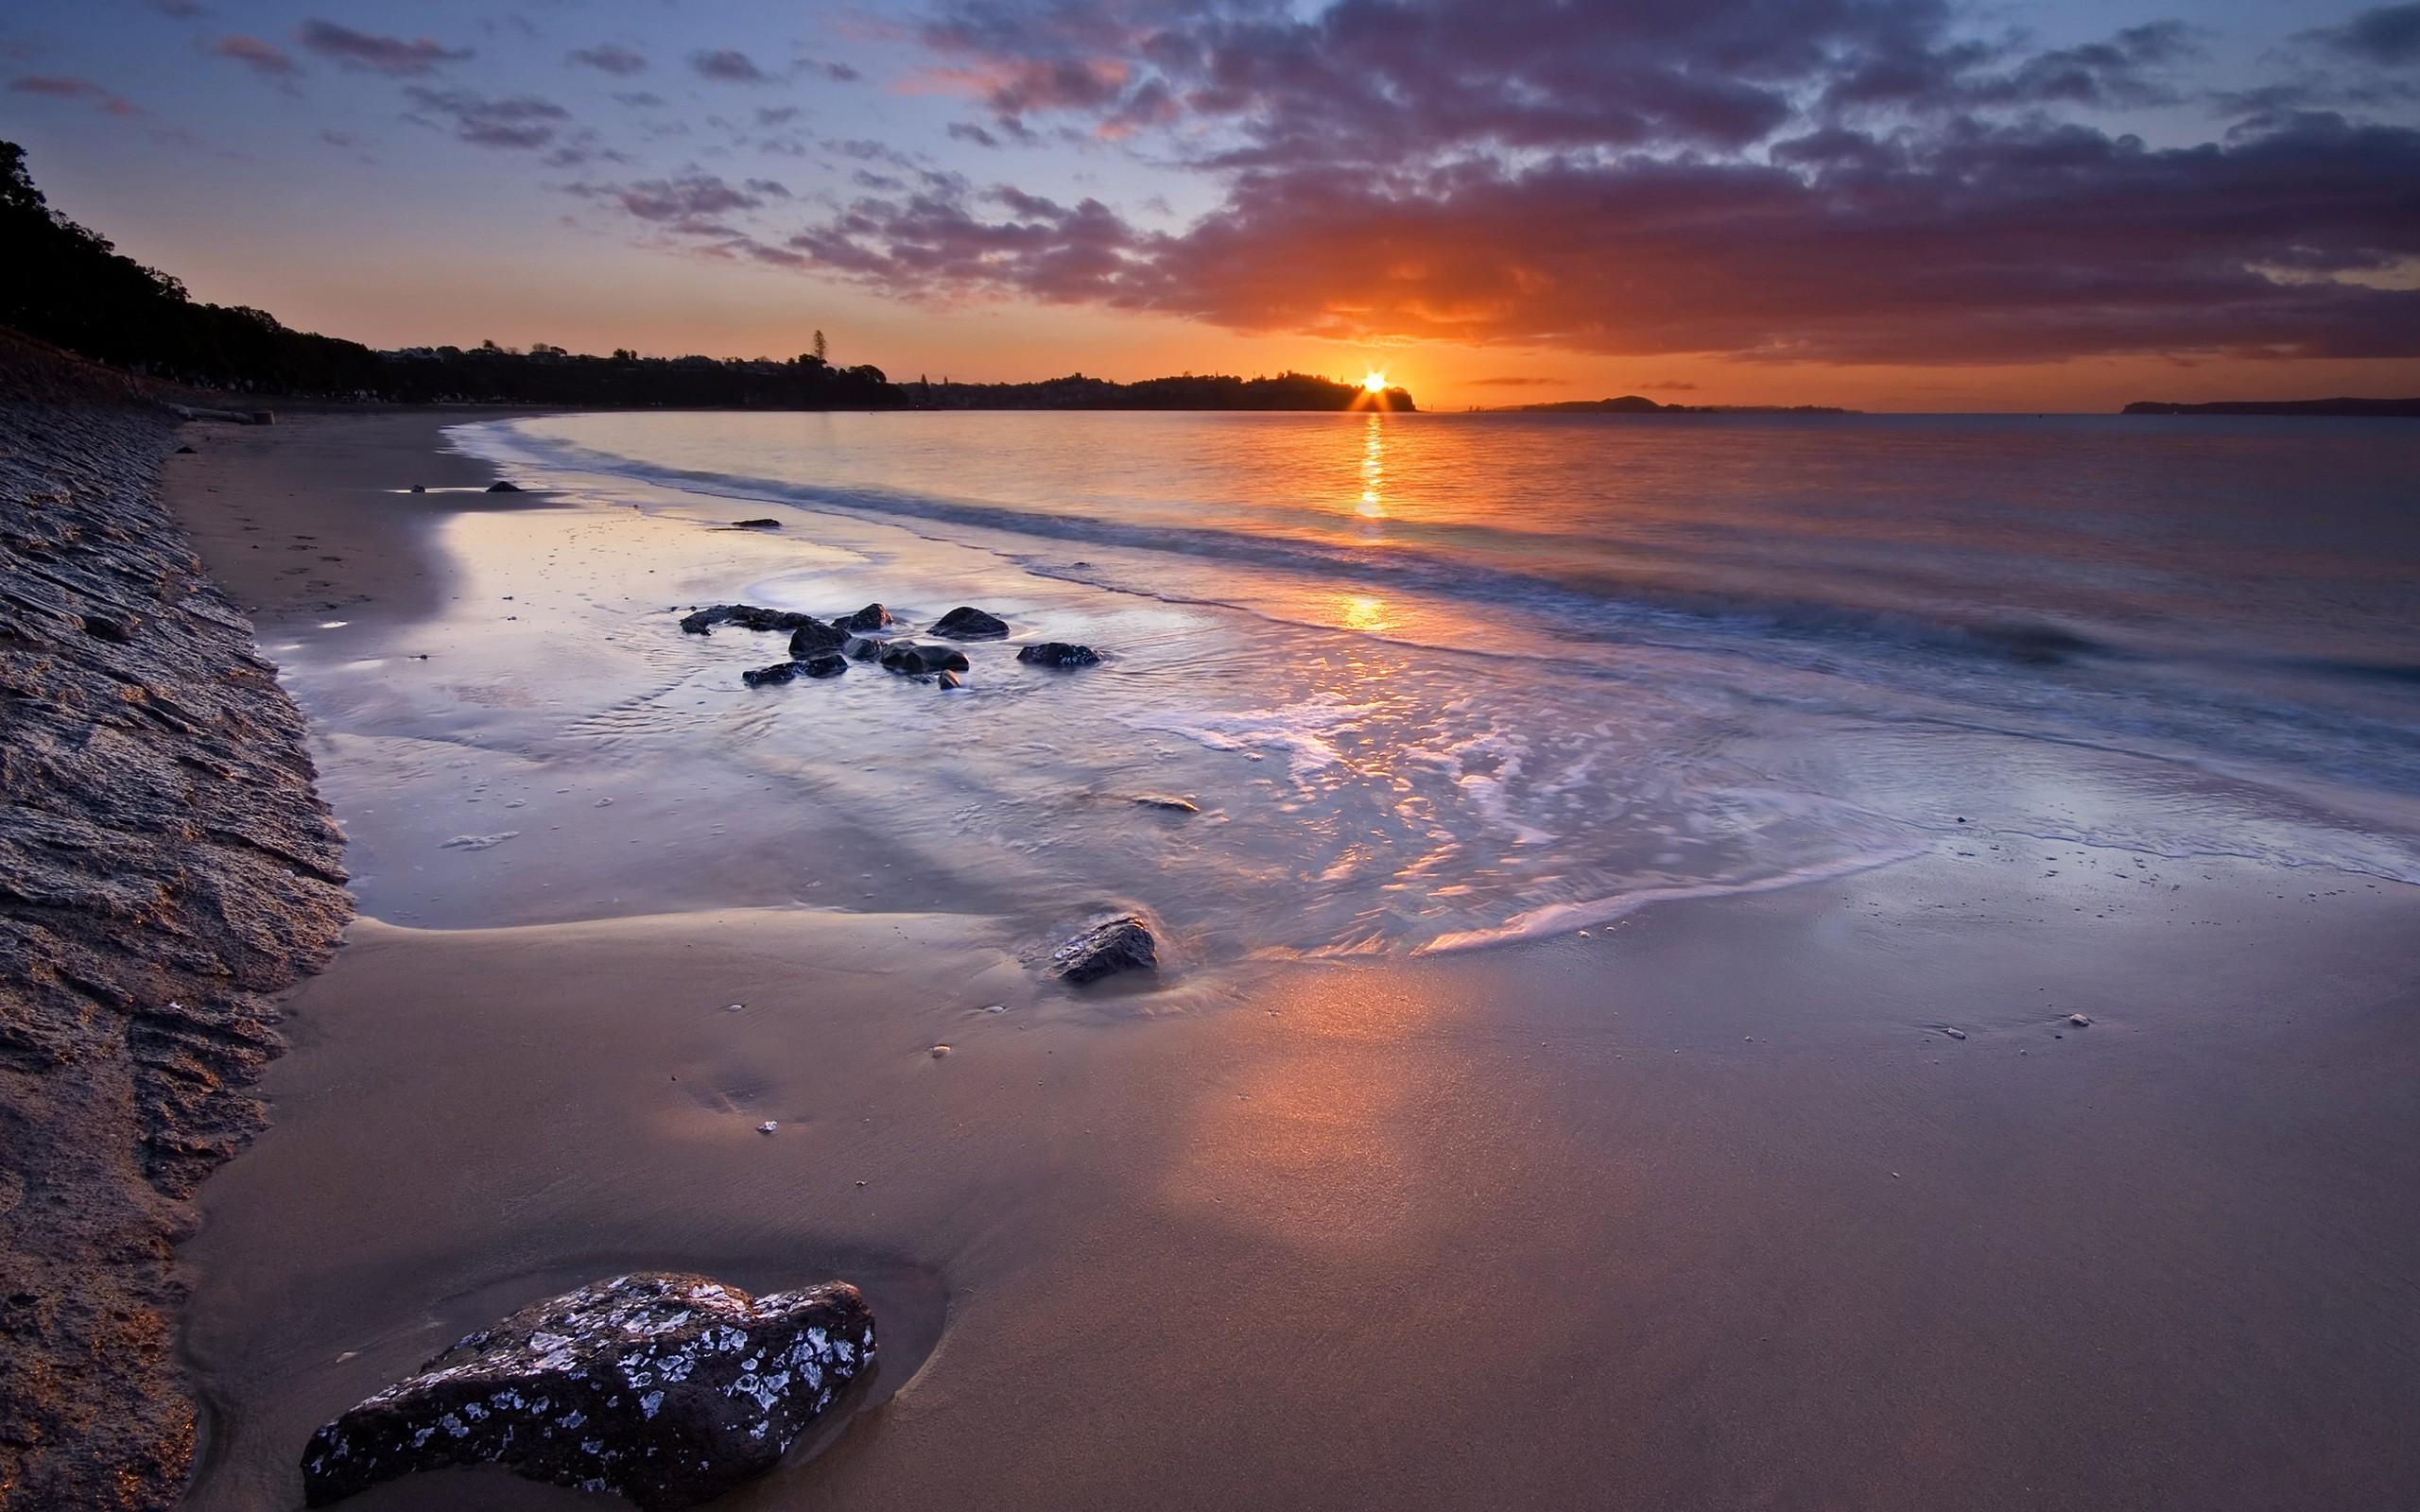 фото с телефона у берега моря табличке